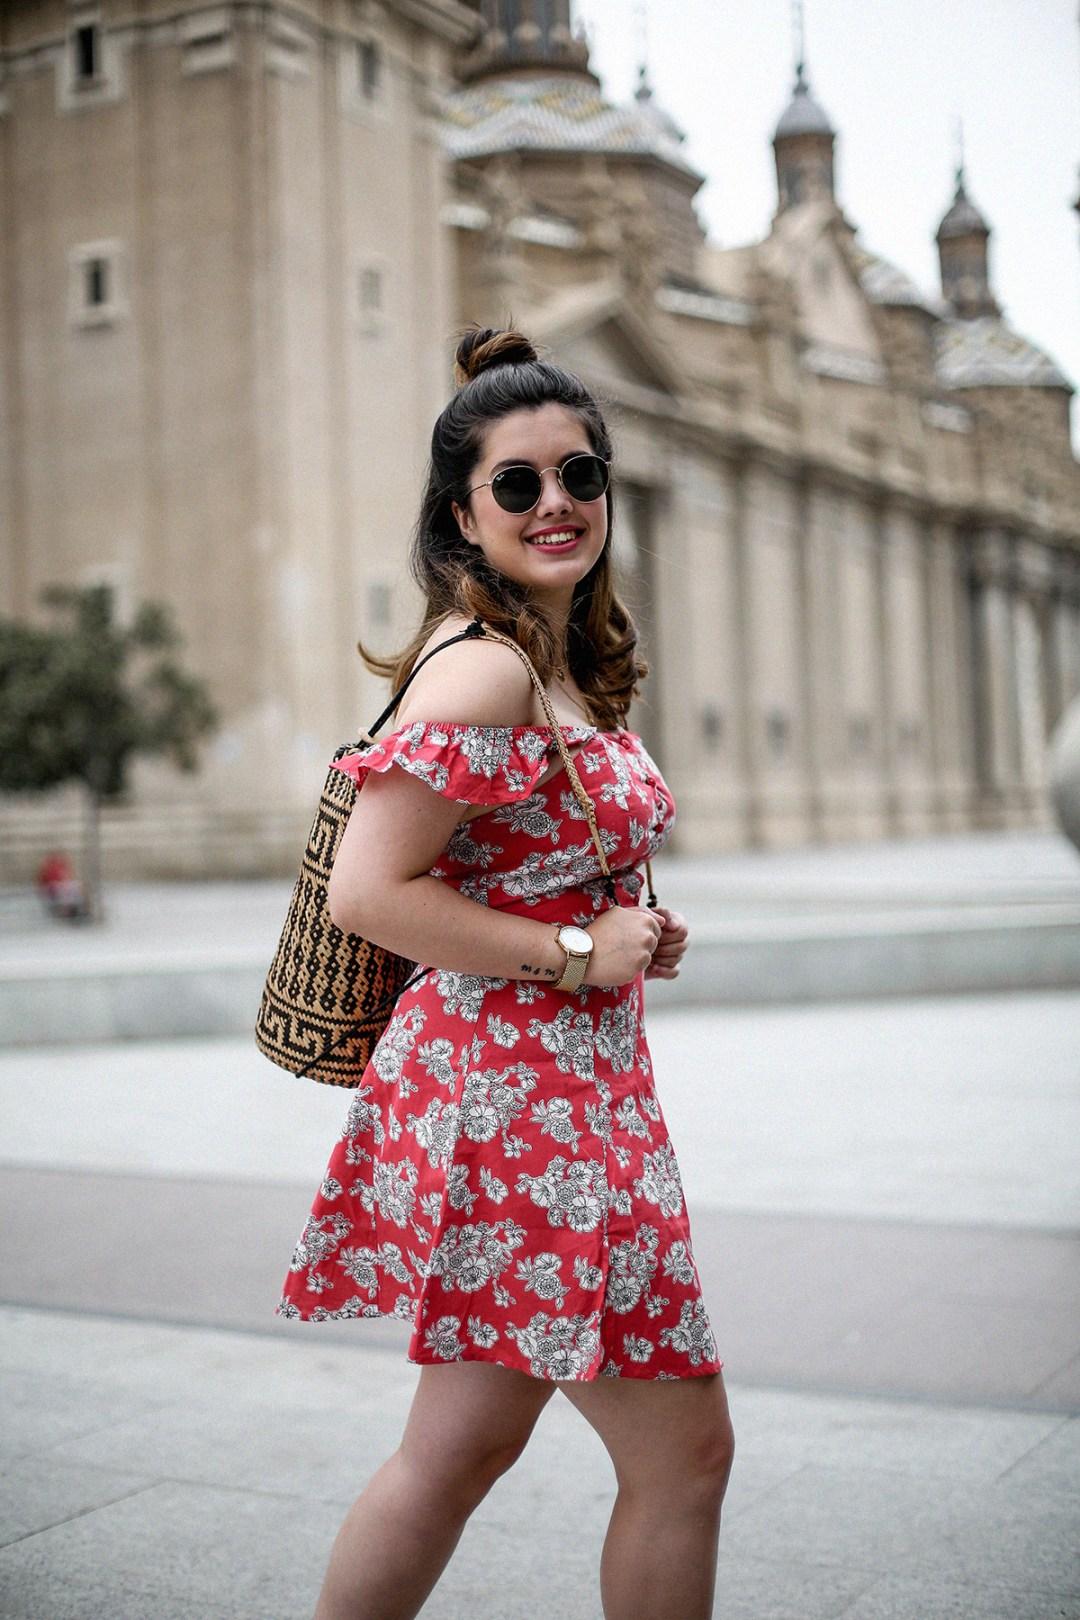 vestido-hombros-al-aire-asos-mochila-ratan-zaragoza-travel4